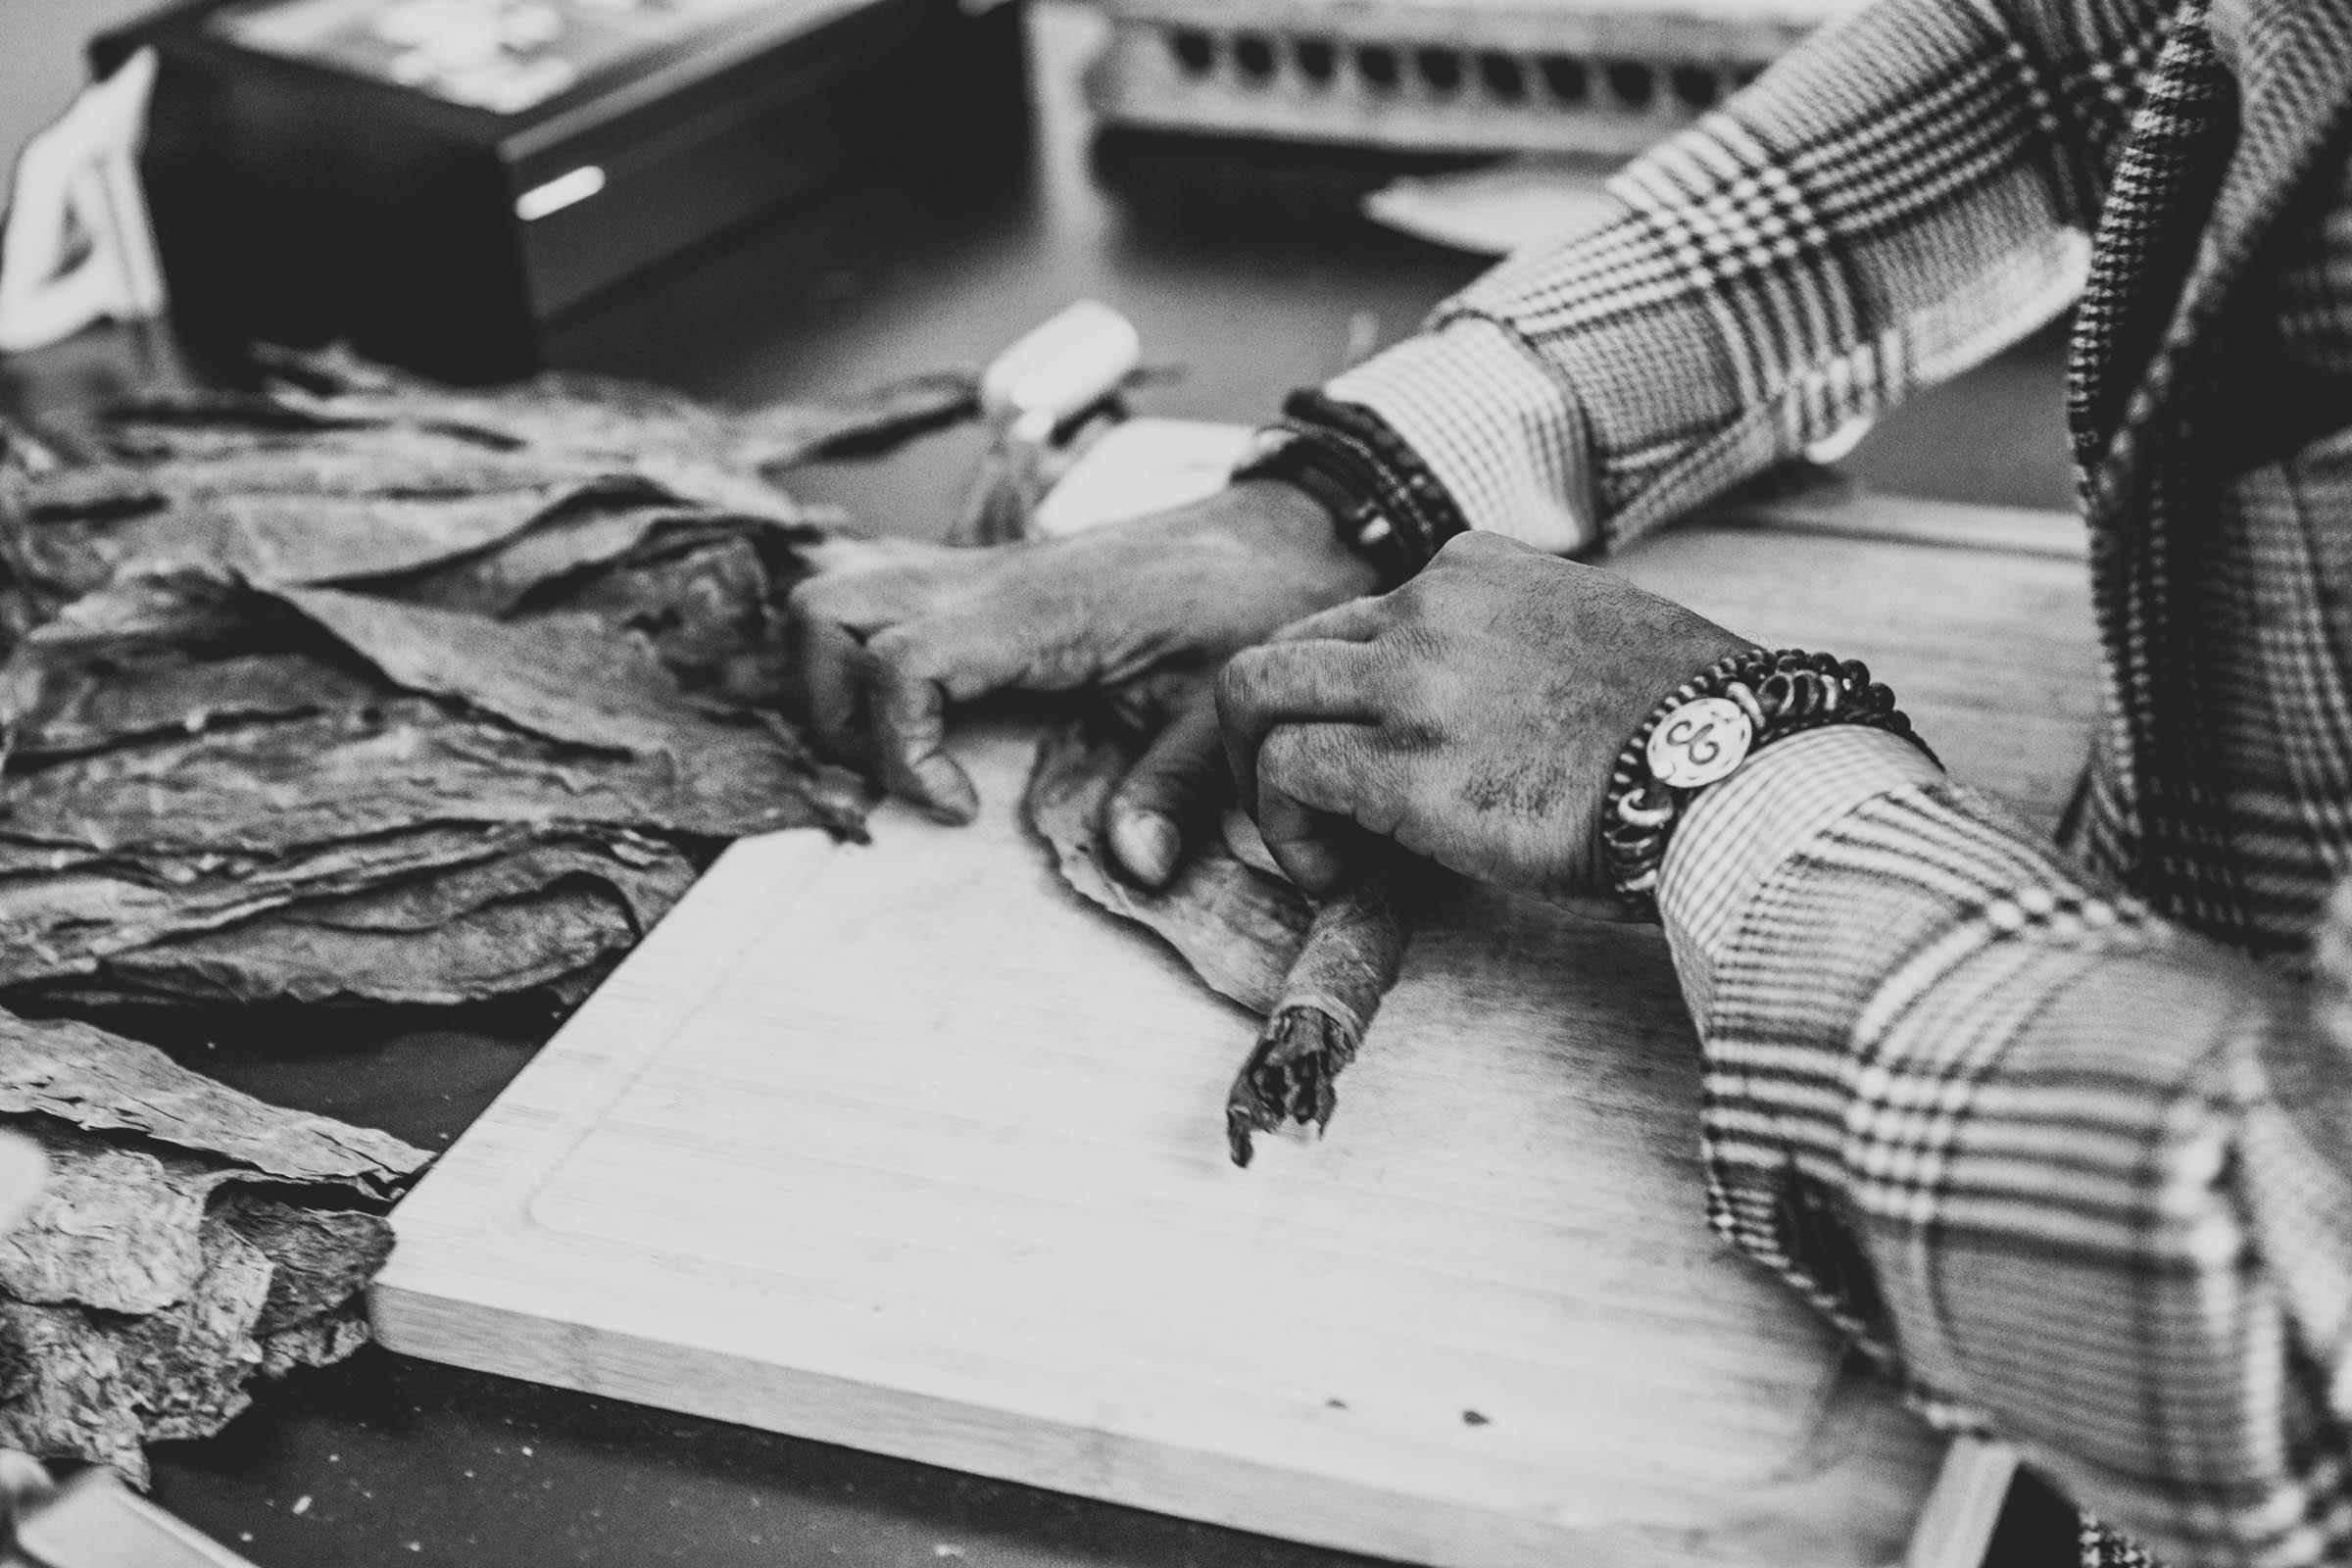 Zigarrenroller | Zigarrendreher |Zigarren |Cigar | Persönlich | Individuell |Havana | Kuba |Event |Buchen |Mieten